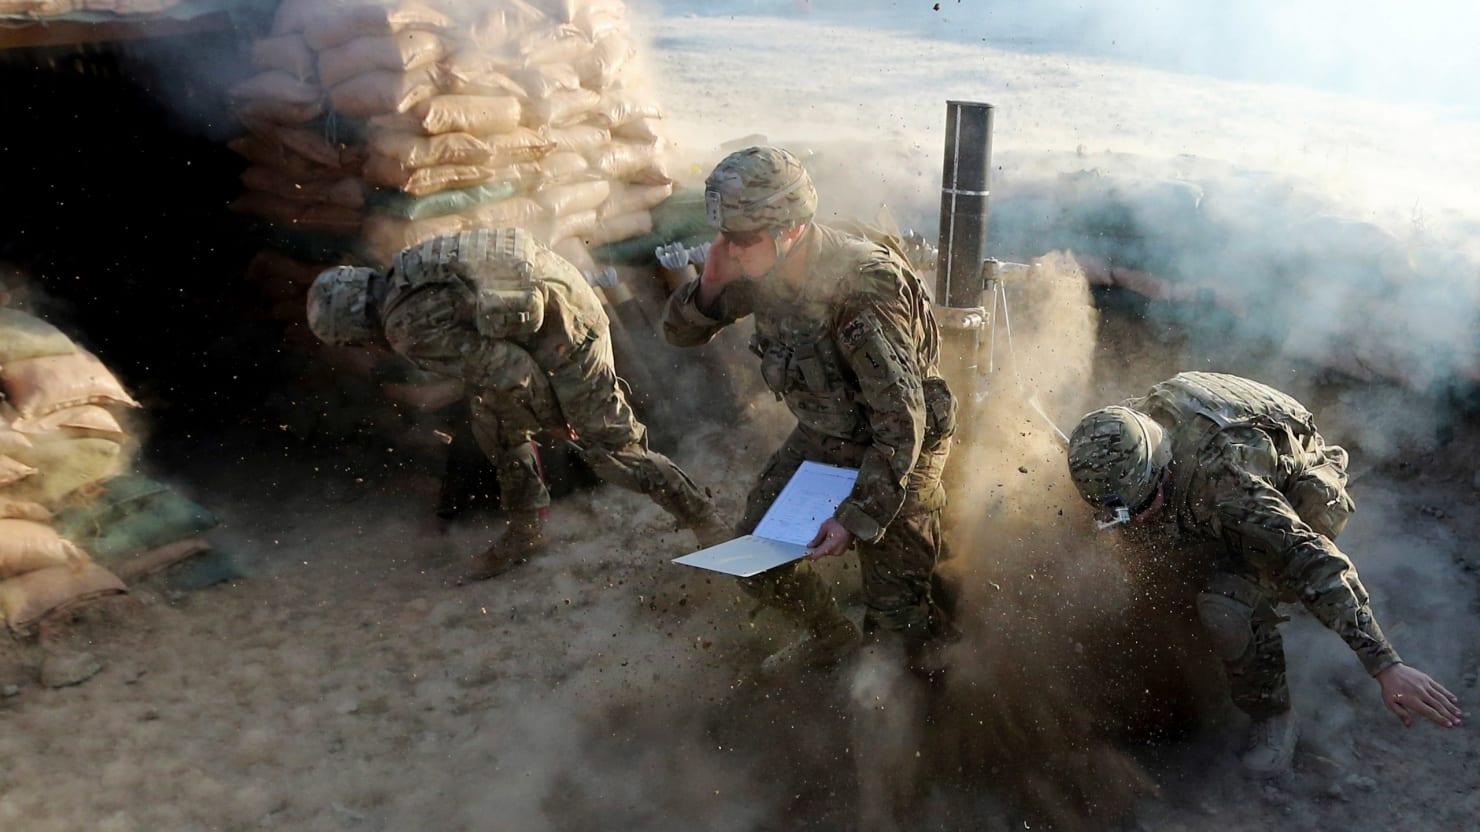 How Bomb Blasts Change Soldiers' Brains